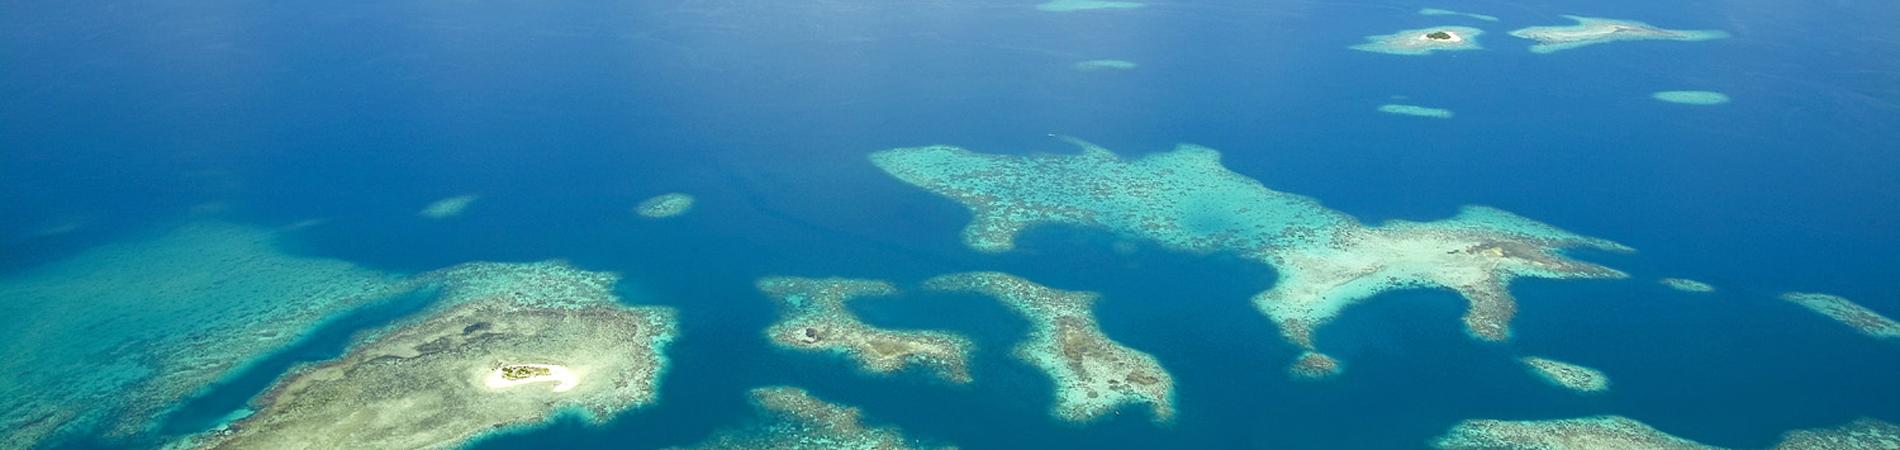 Philippines tourism PHI Samar Islets header